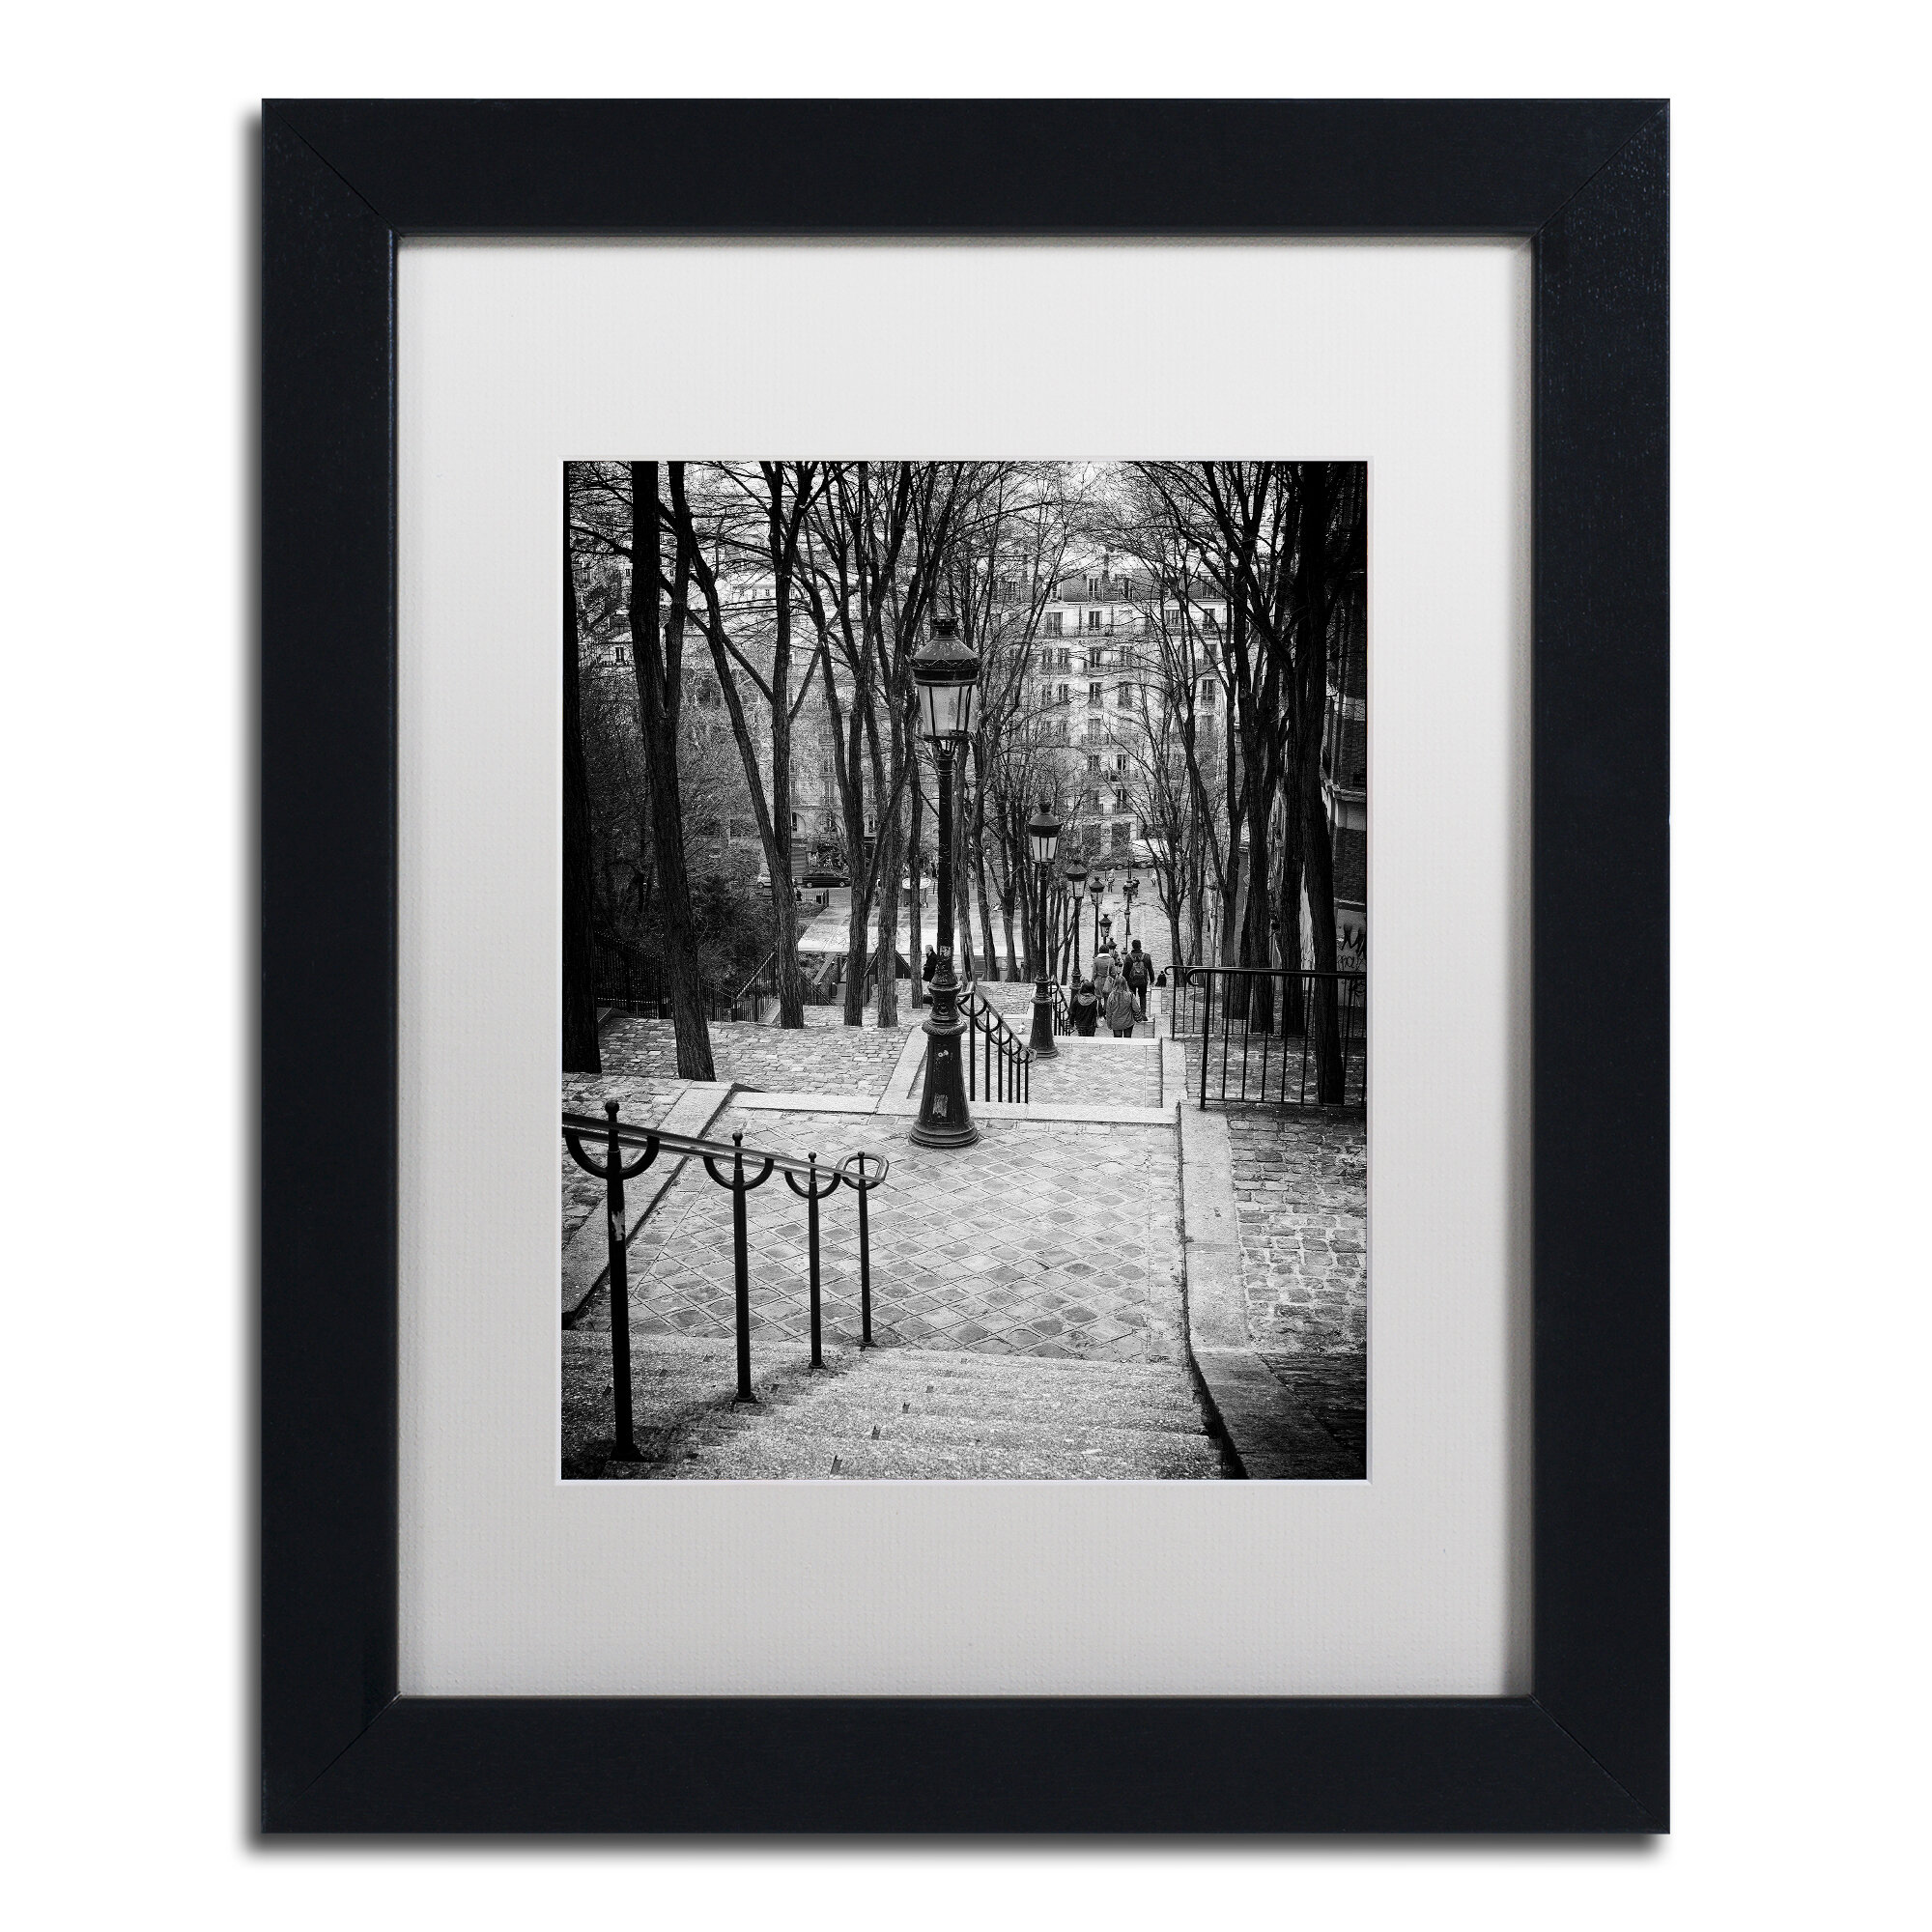 Trademark Art Staircase Montmartre By Philippe Hugonnard Framed Photographic Print Wayfair